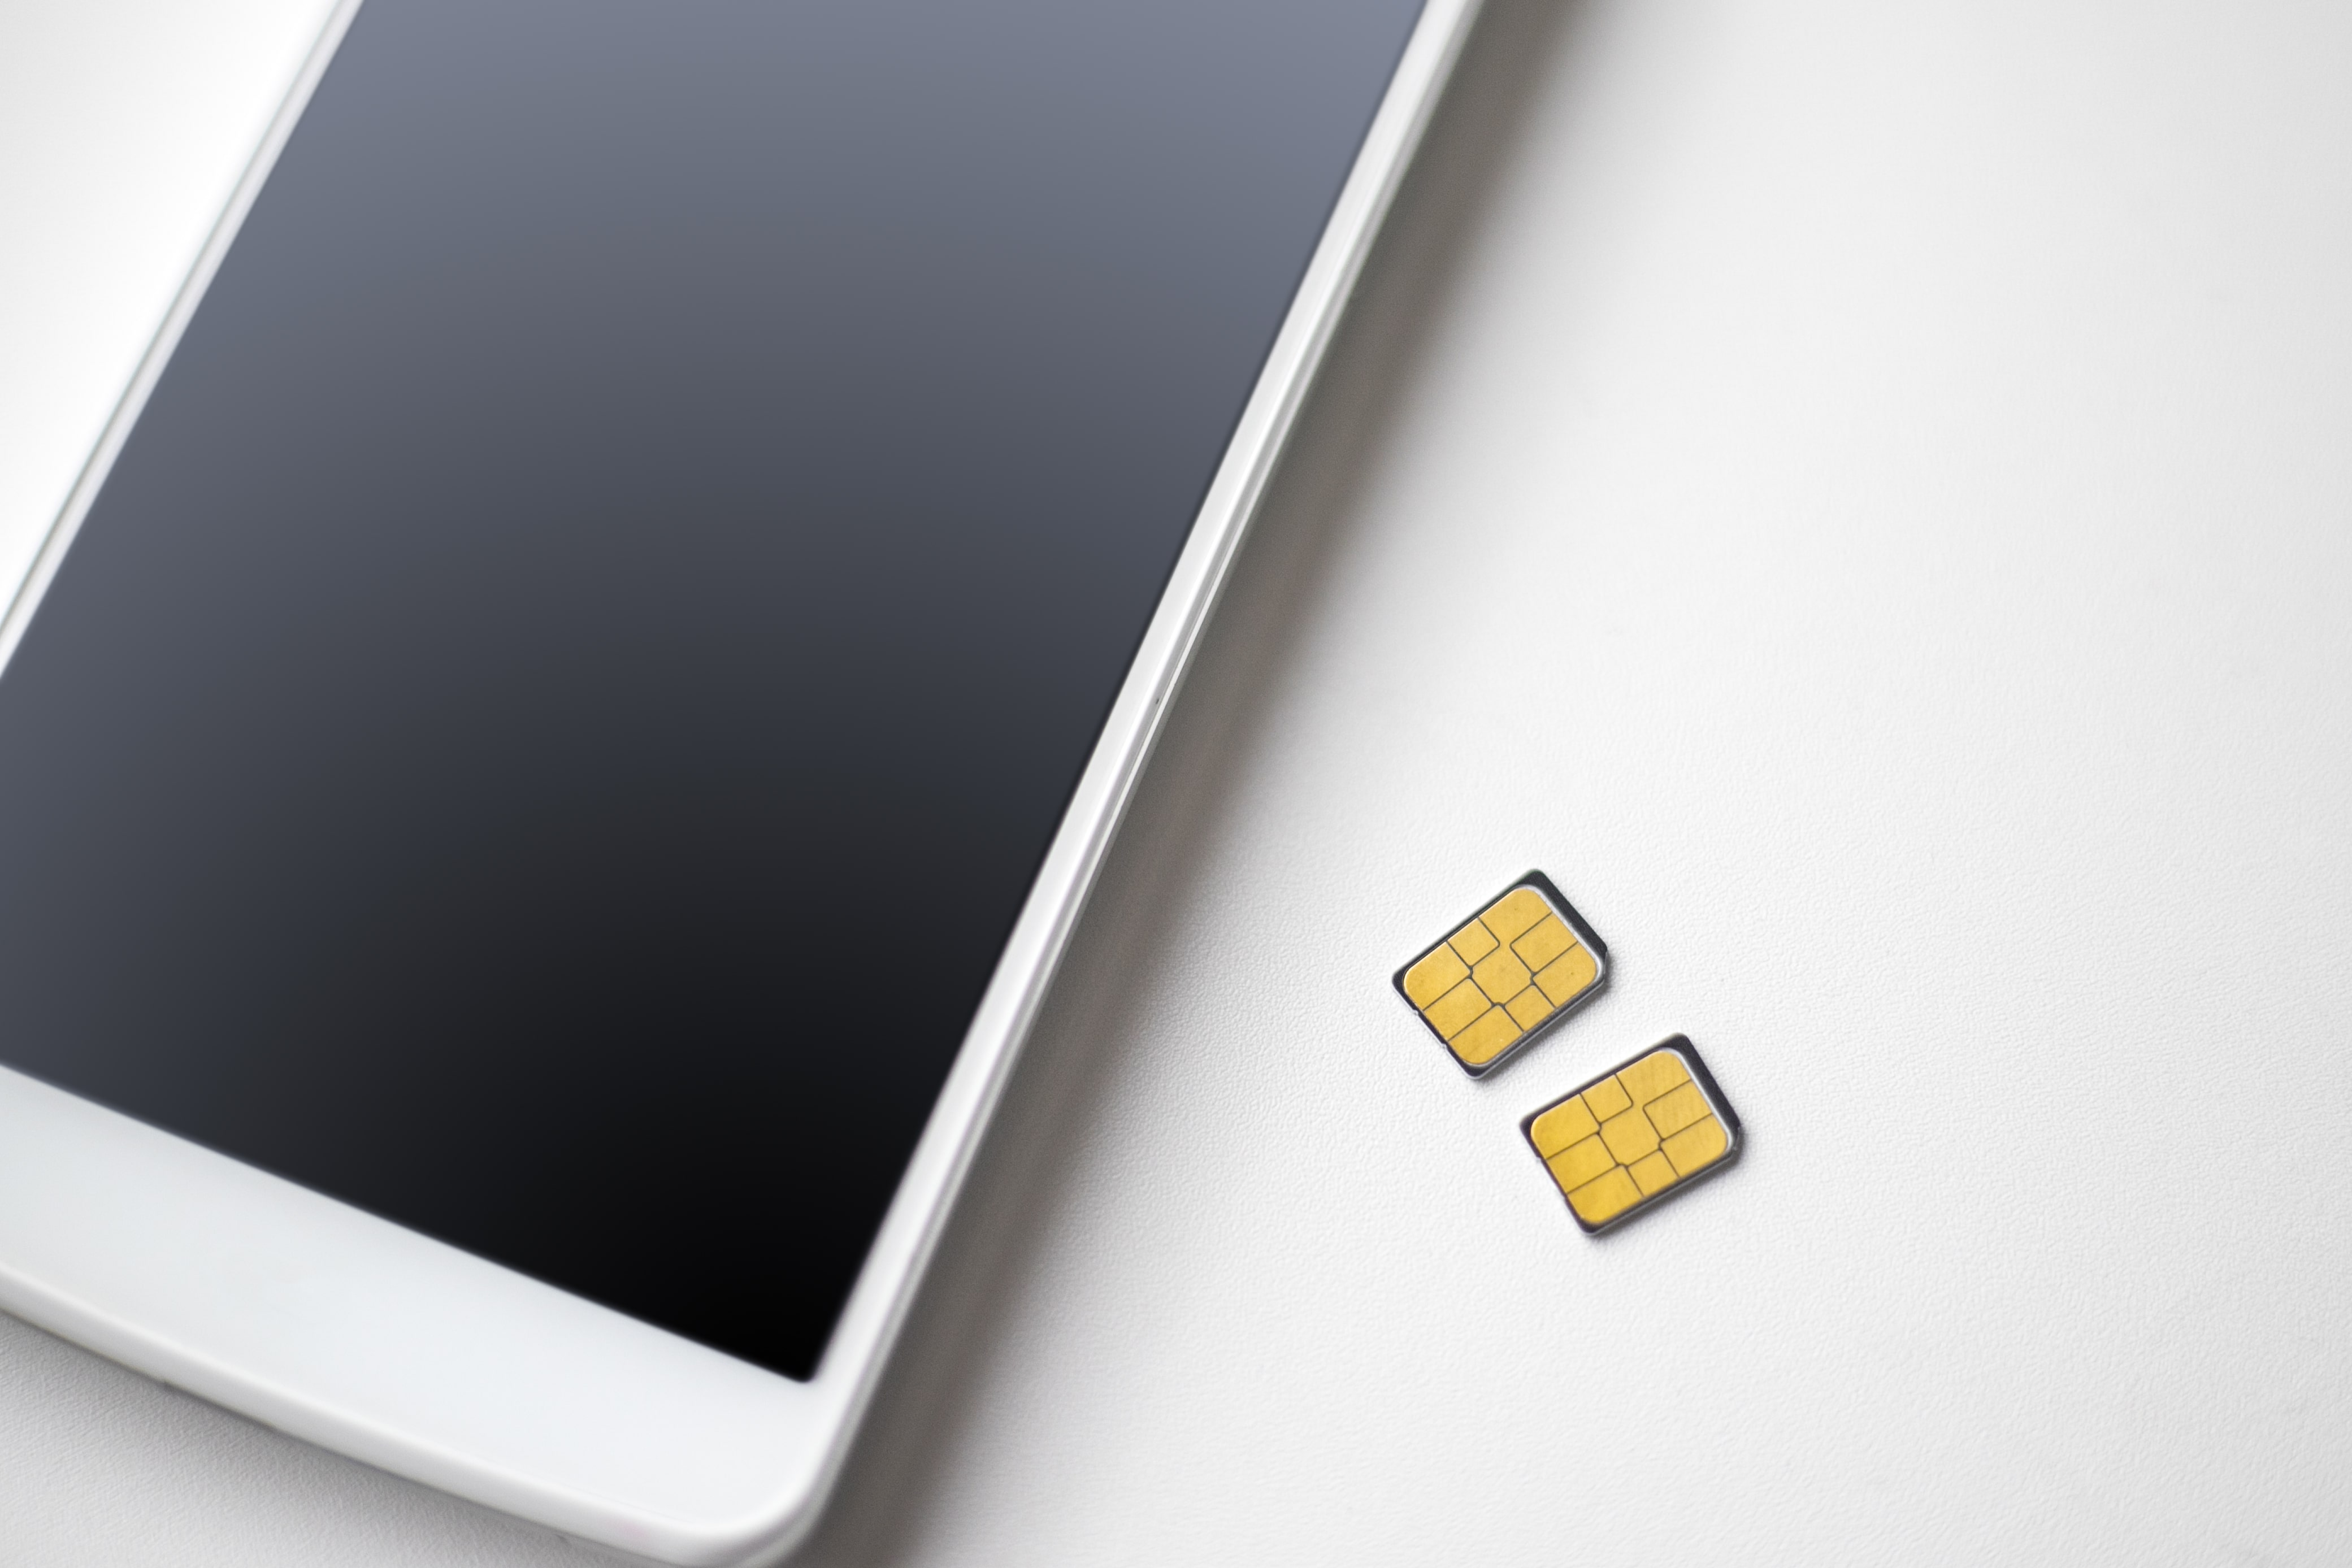 sim card and mobile phone